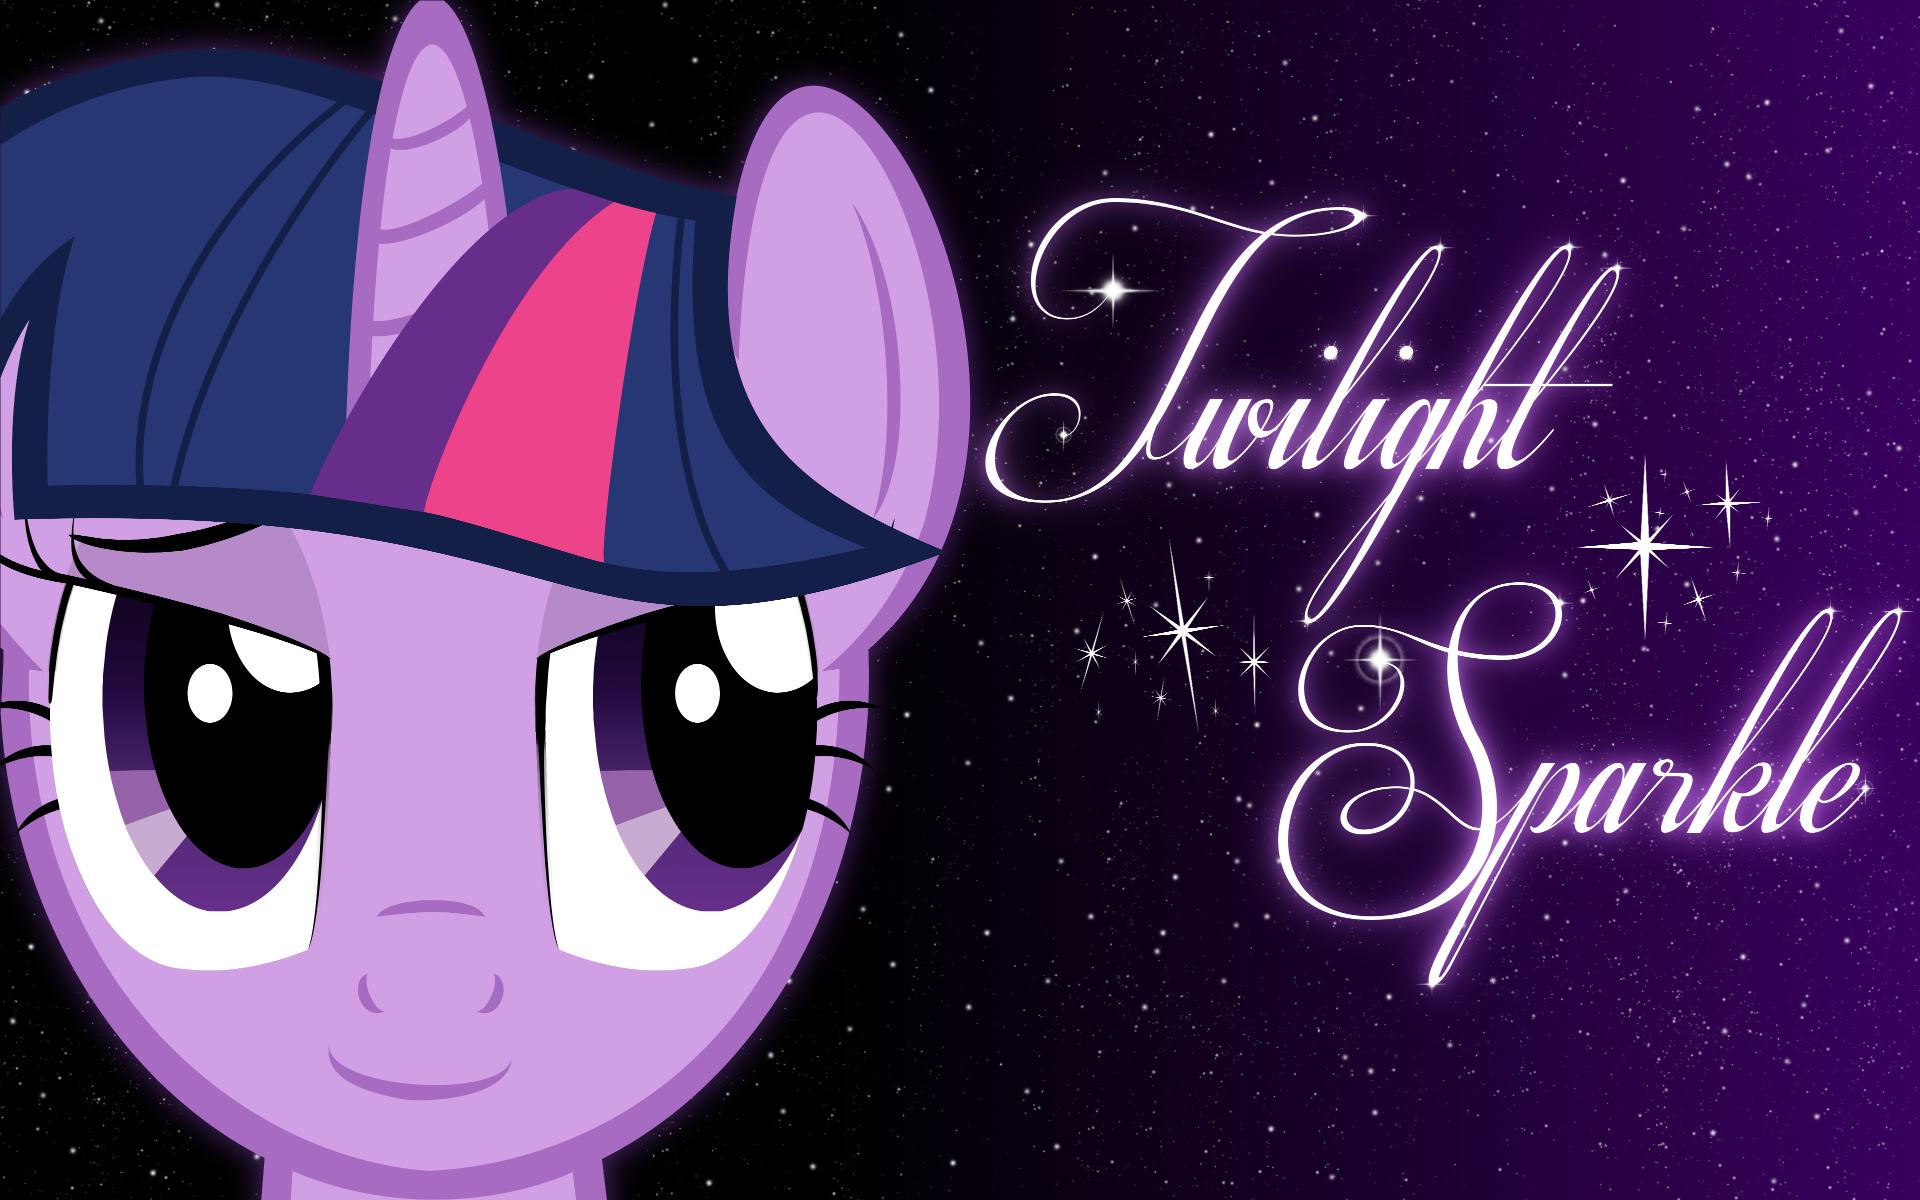 twilight sparkle wallpaper - photo #18